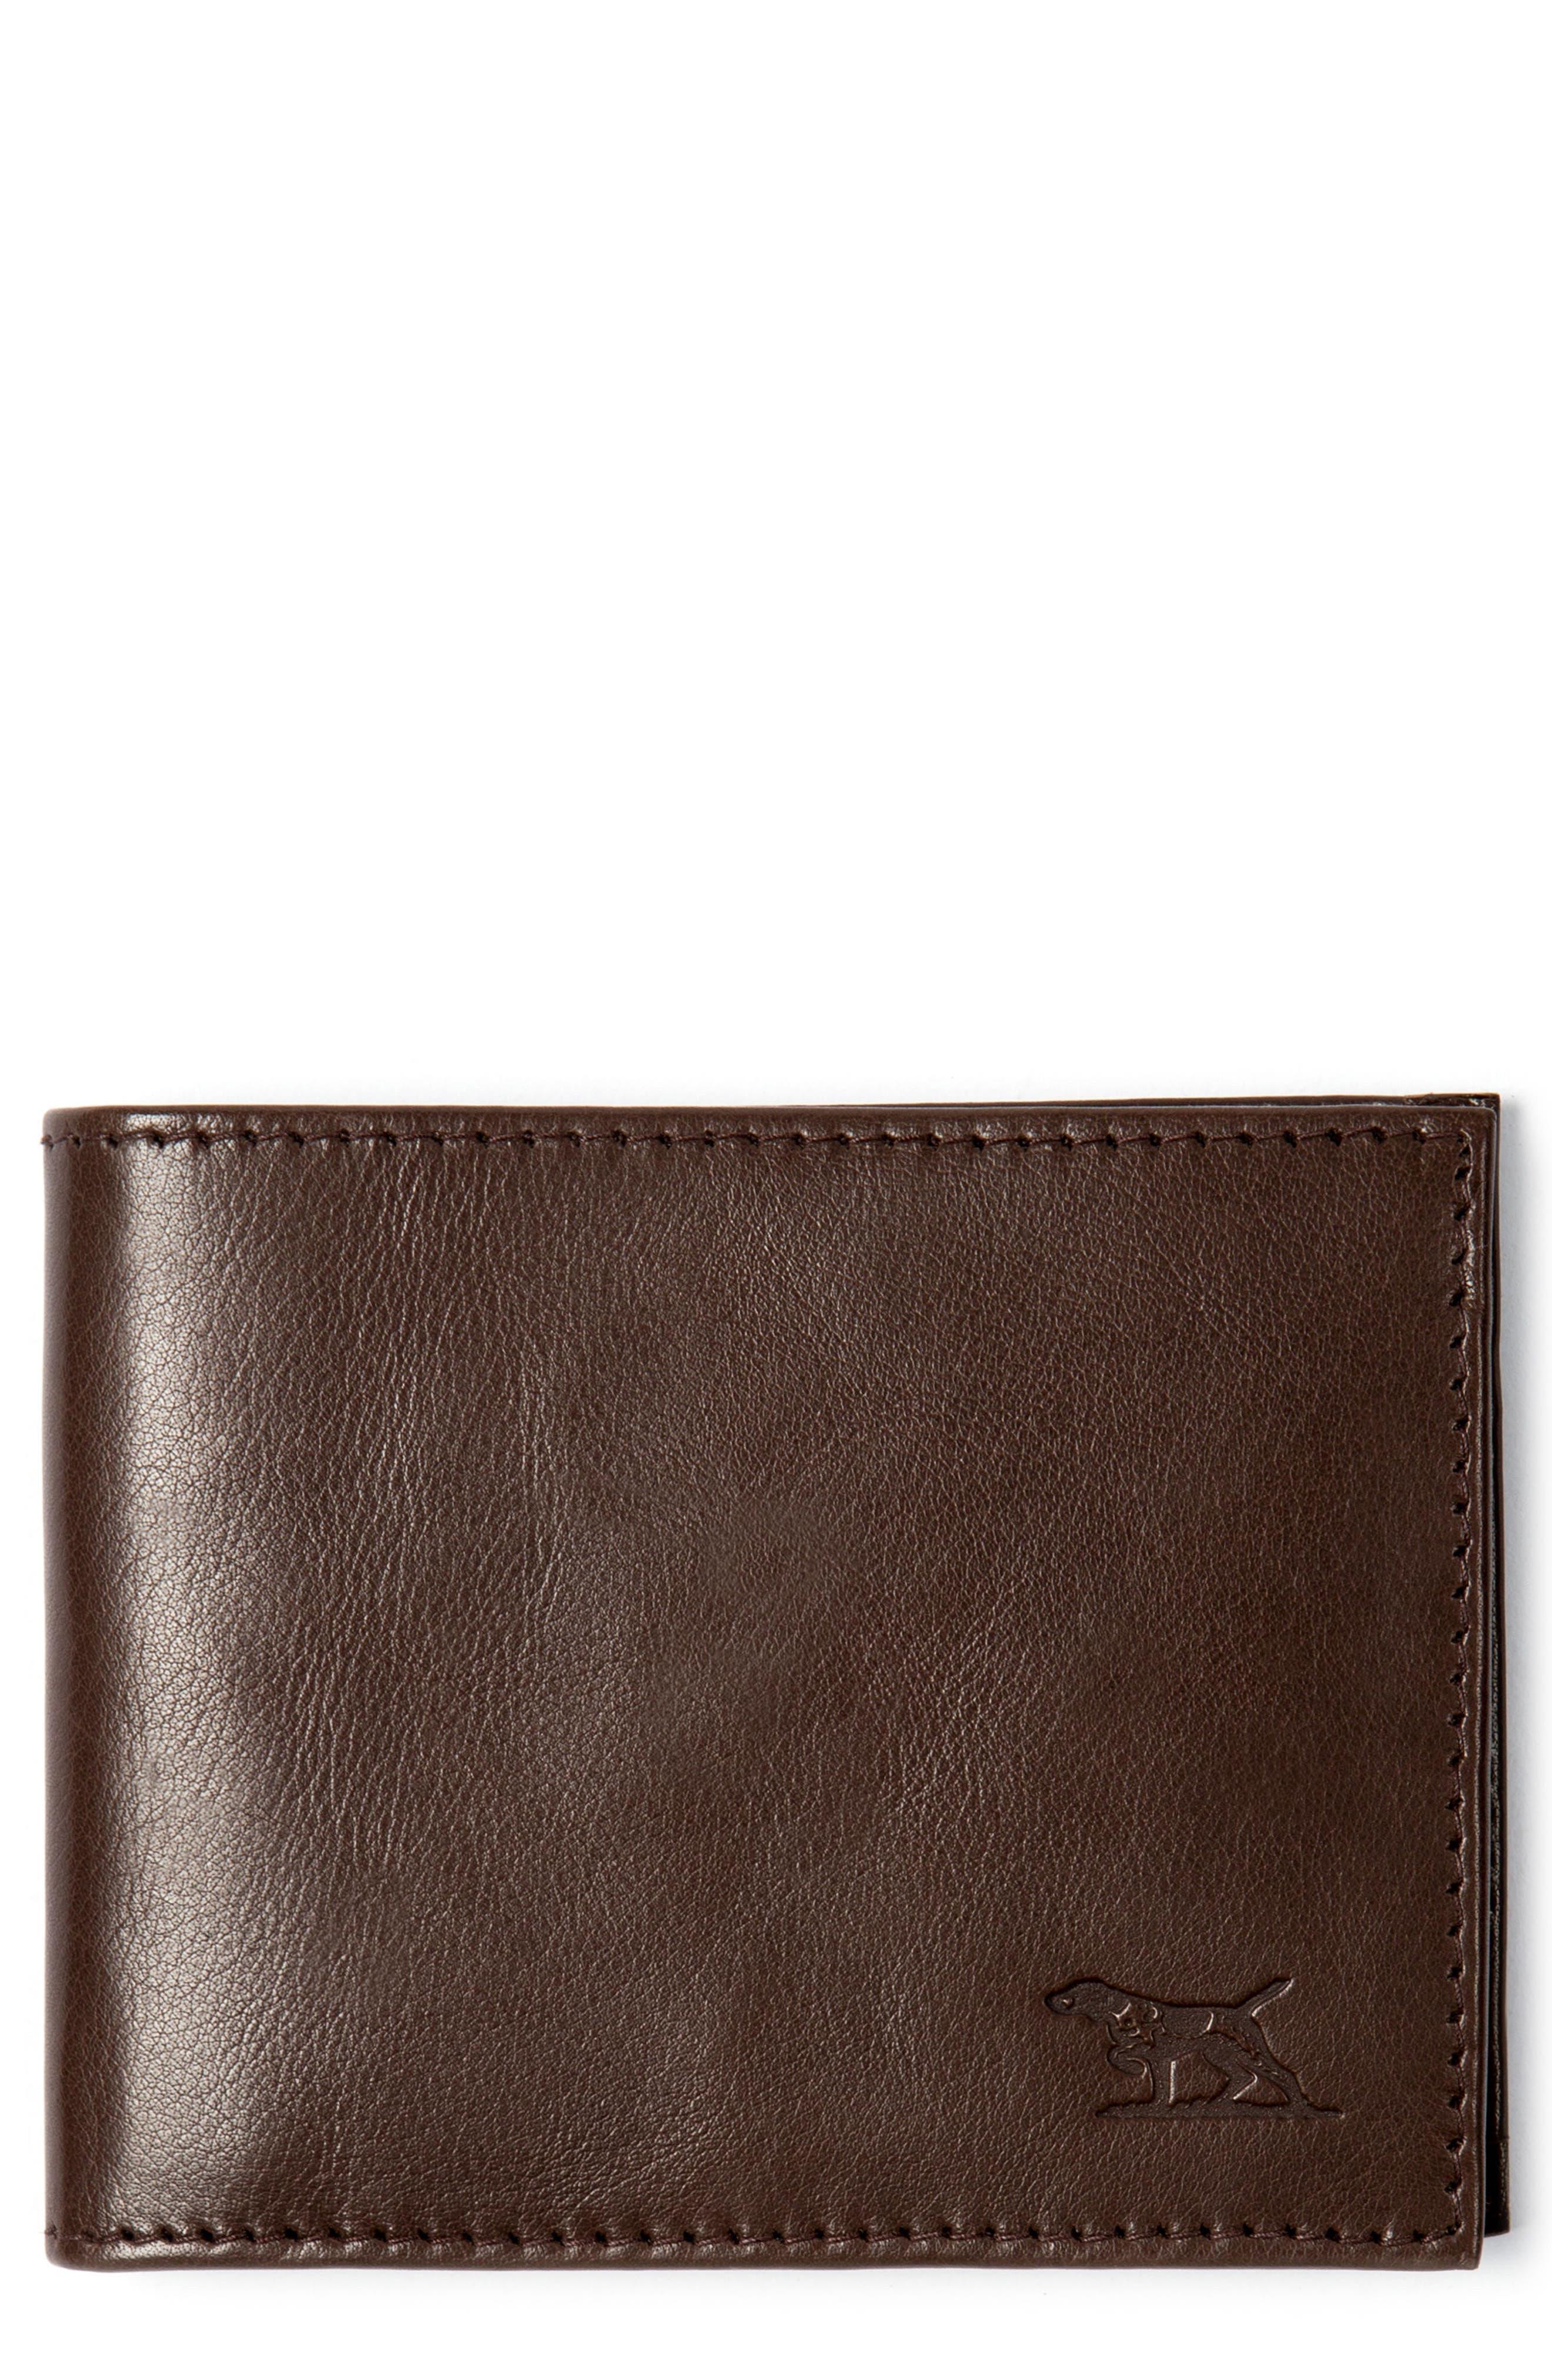 Leeston Wallet,                             Main thumbnail 1, color,                             CREEK